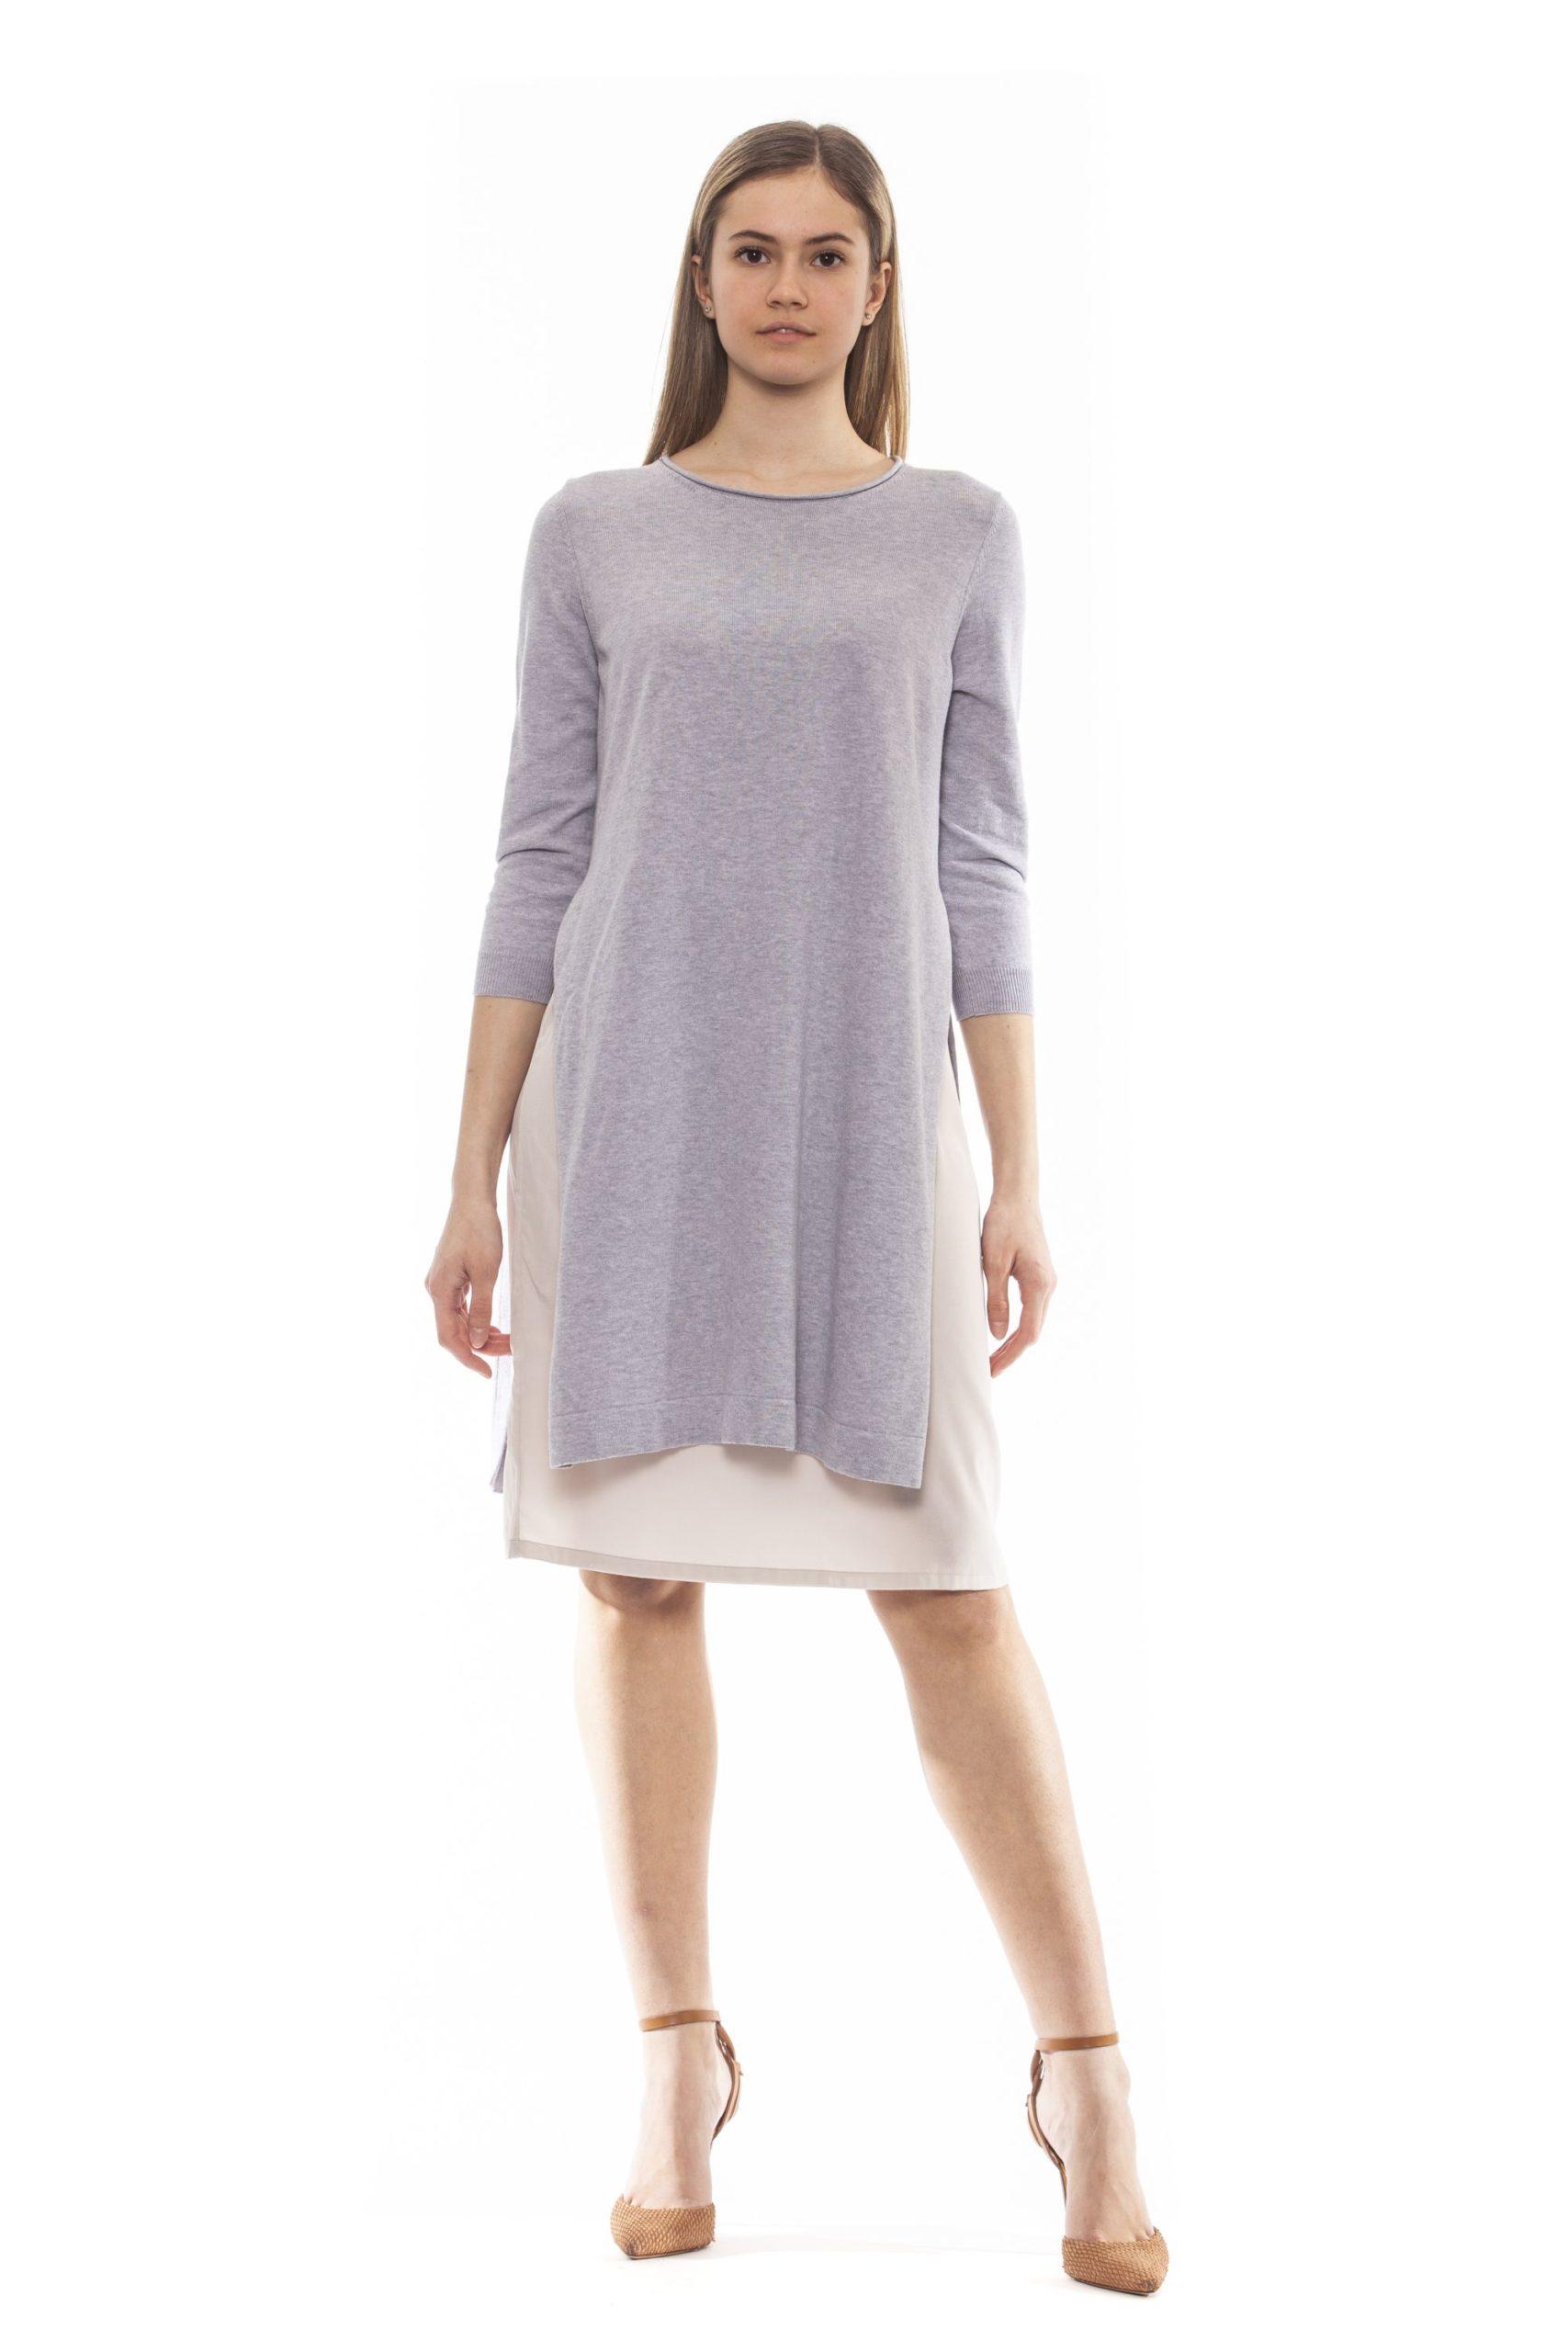 Peserico Women's Grigio Dress Grey PE1381560 - IT42   S